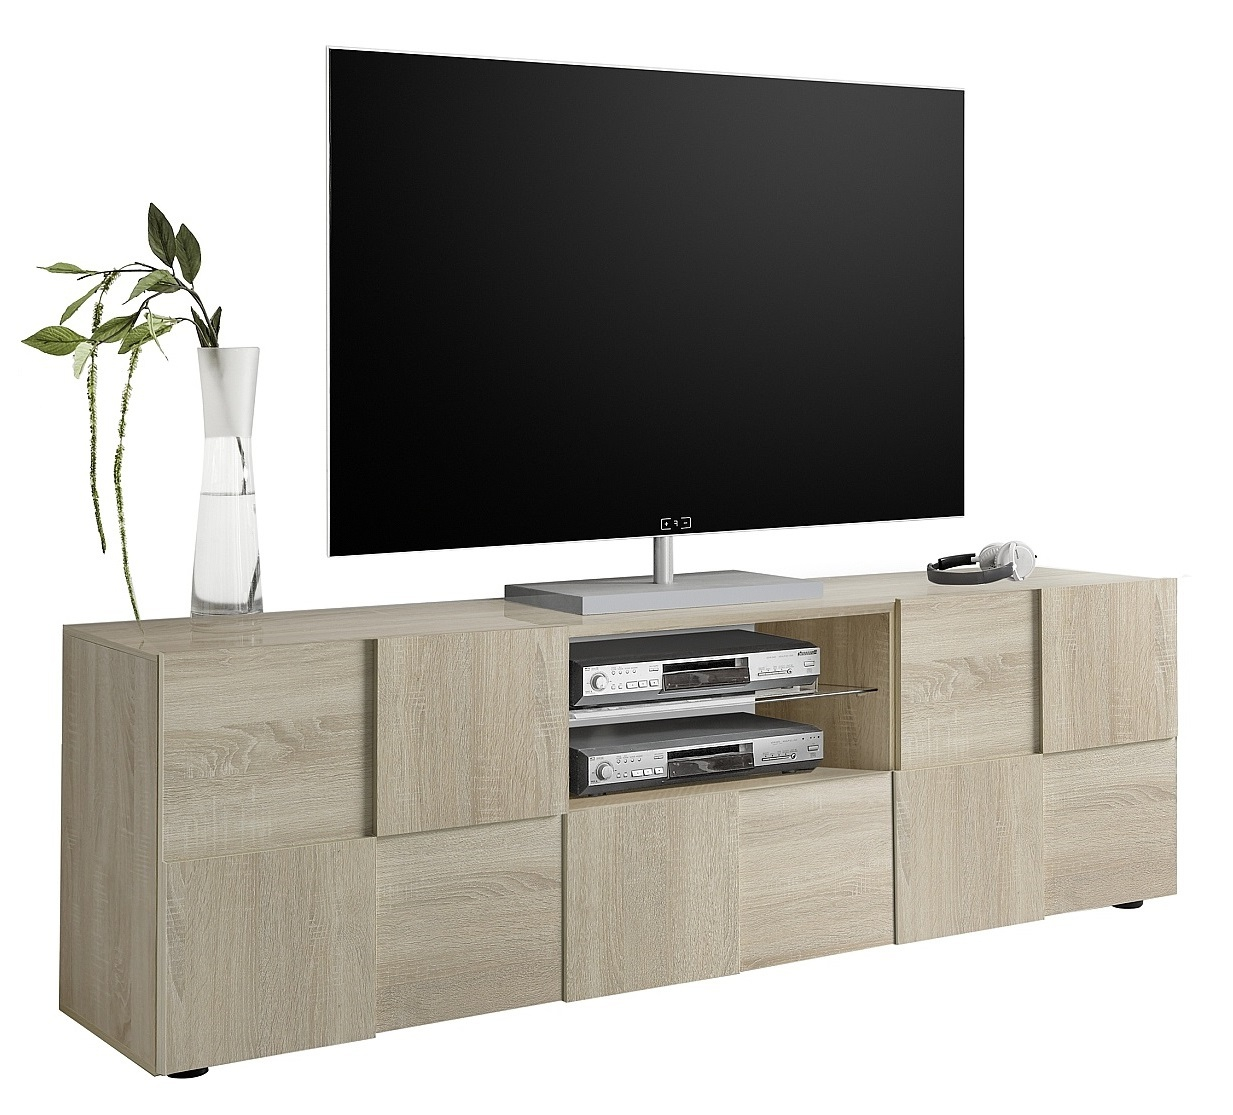 Tv-meubel Dama 181 cm breed in sonoma eiken | Pesaro Mobilia